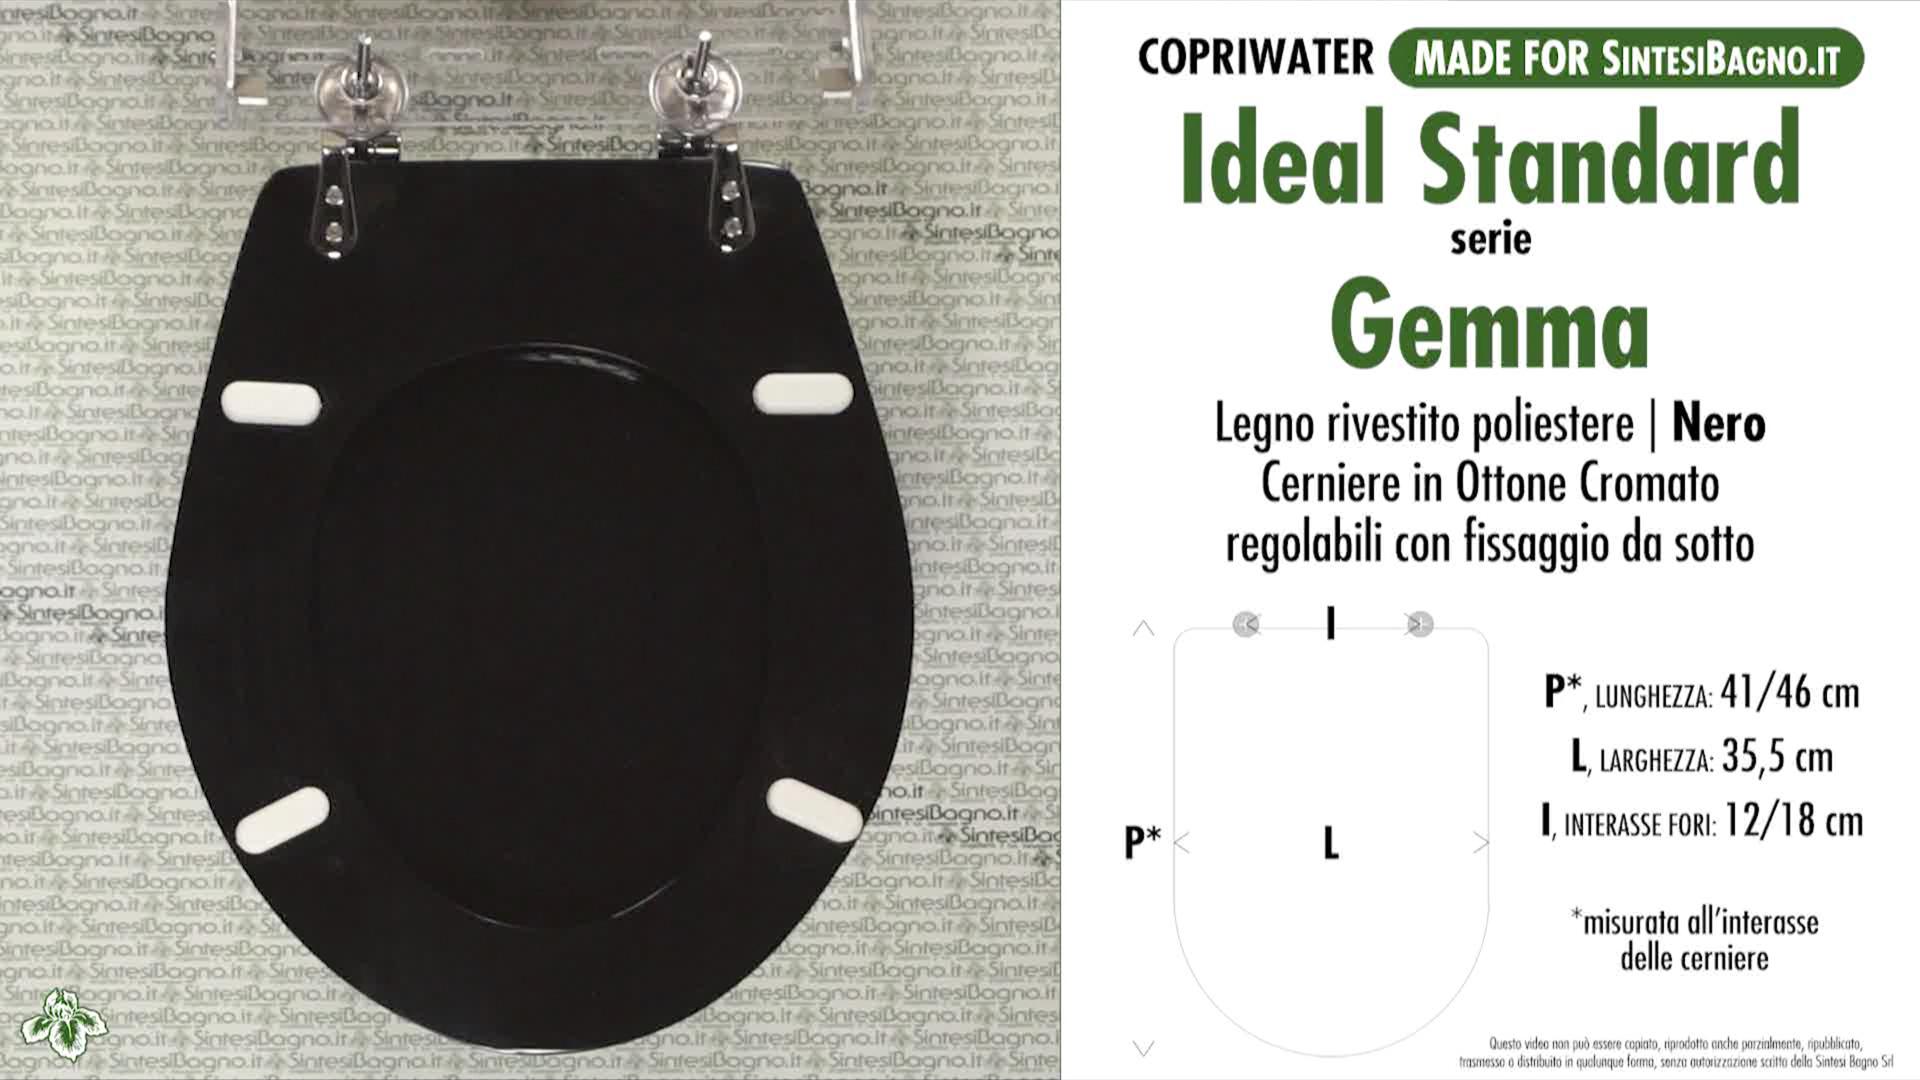 Copriwater Per Vaso Gemma Gemma Sospeso Ideal Standard